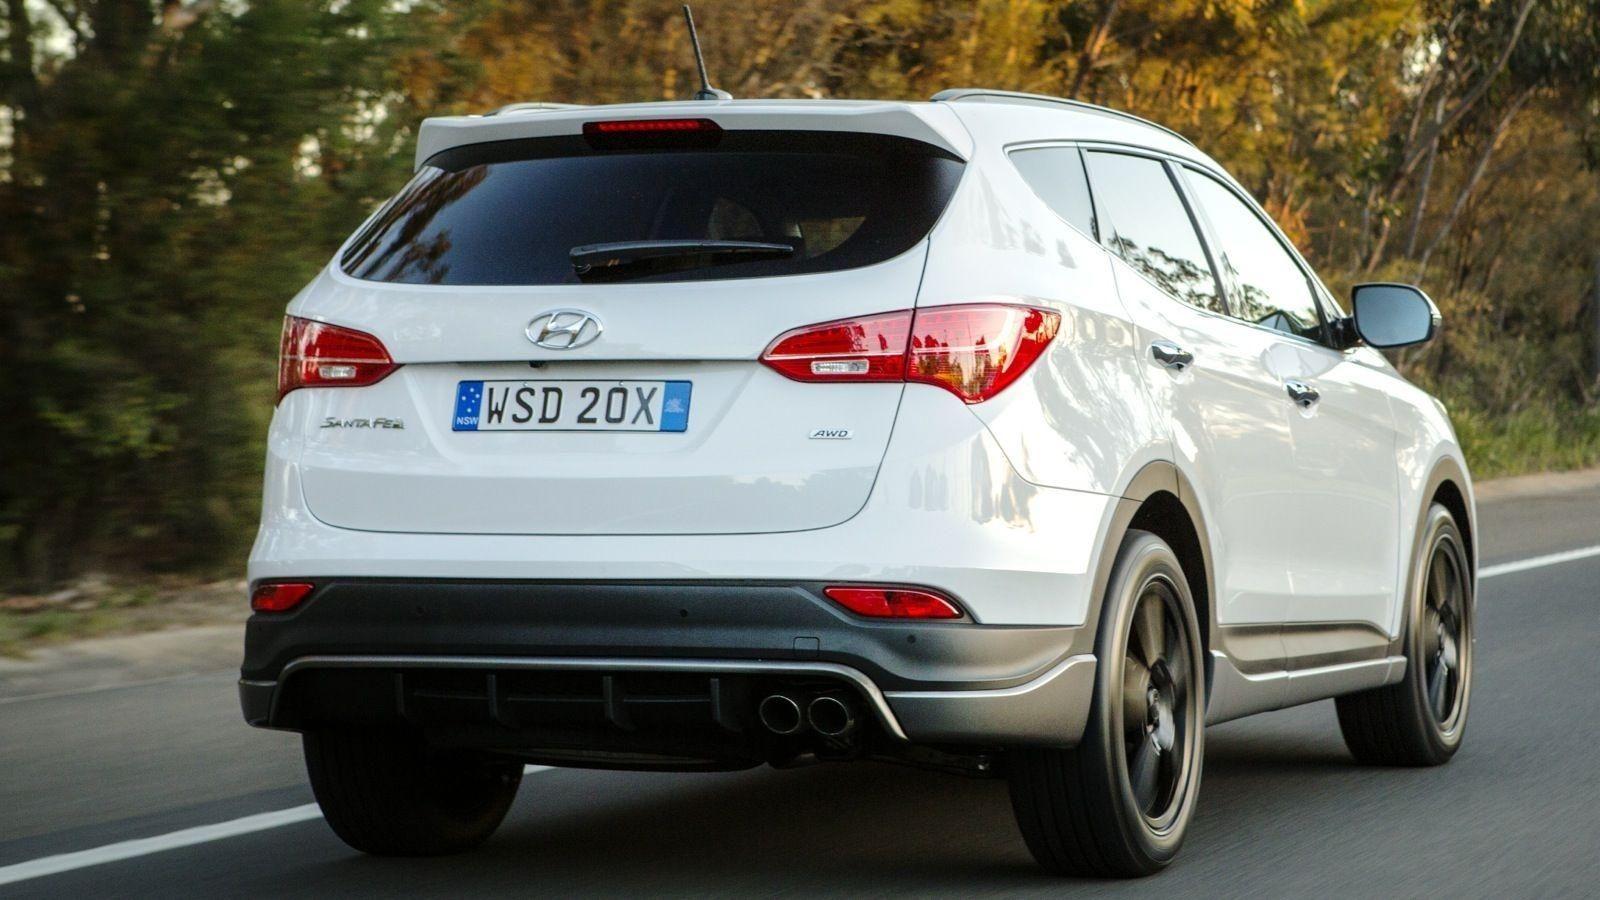 2018 hyundai santa fe review new interior 2018 car review intended rh pinterest com